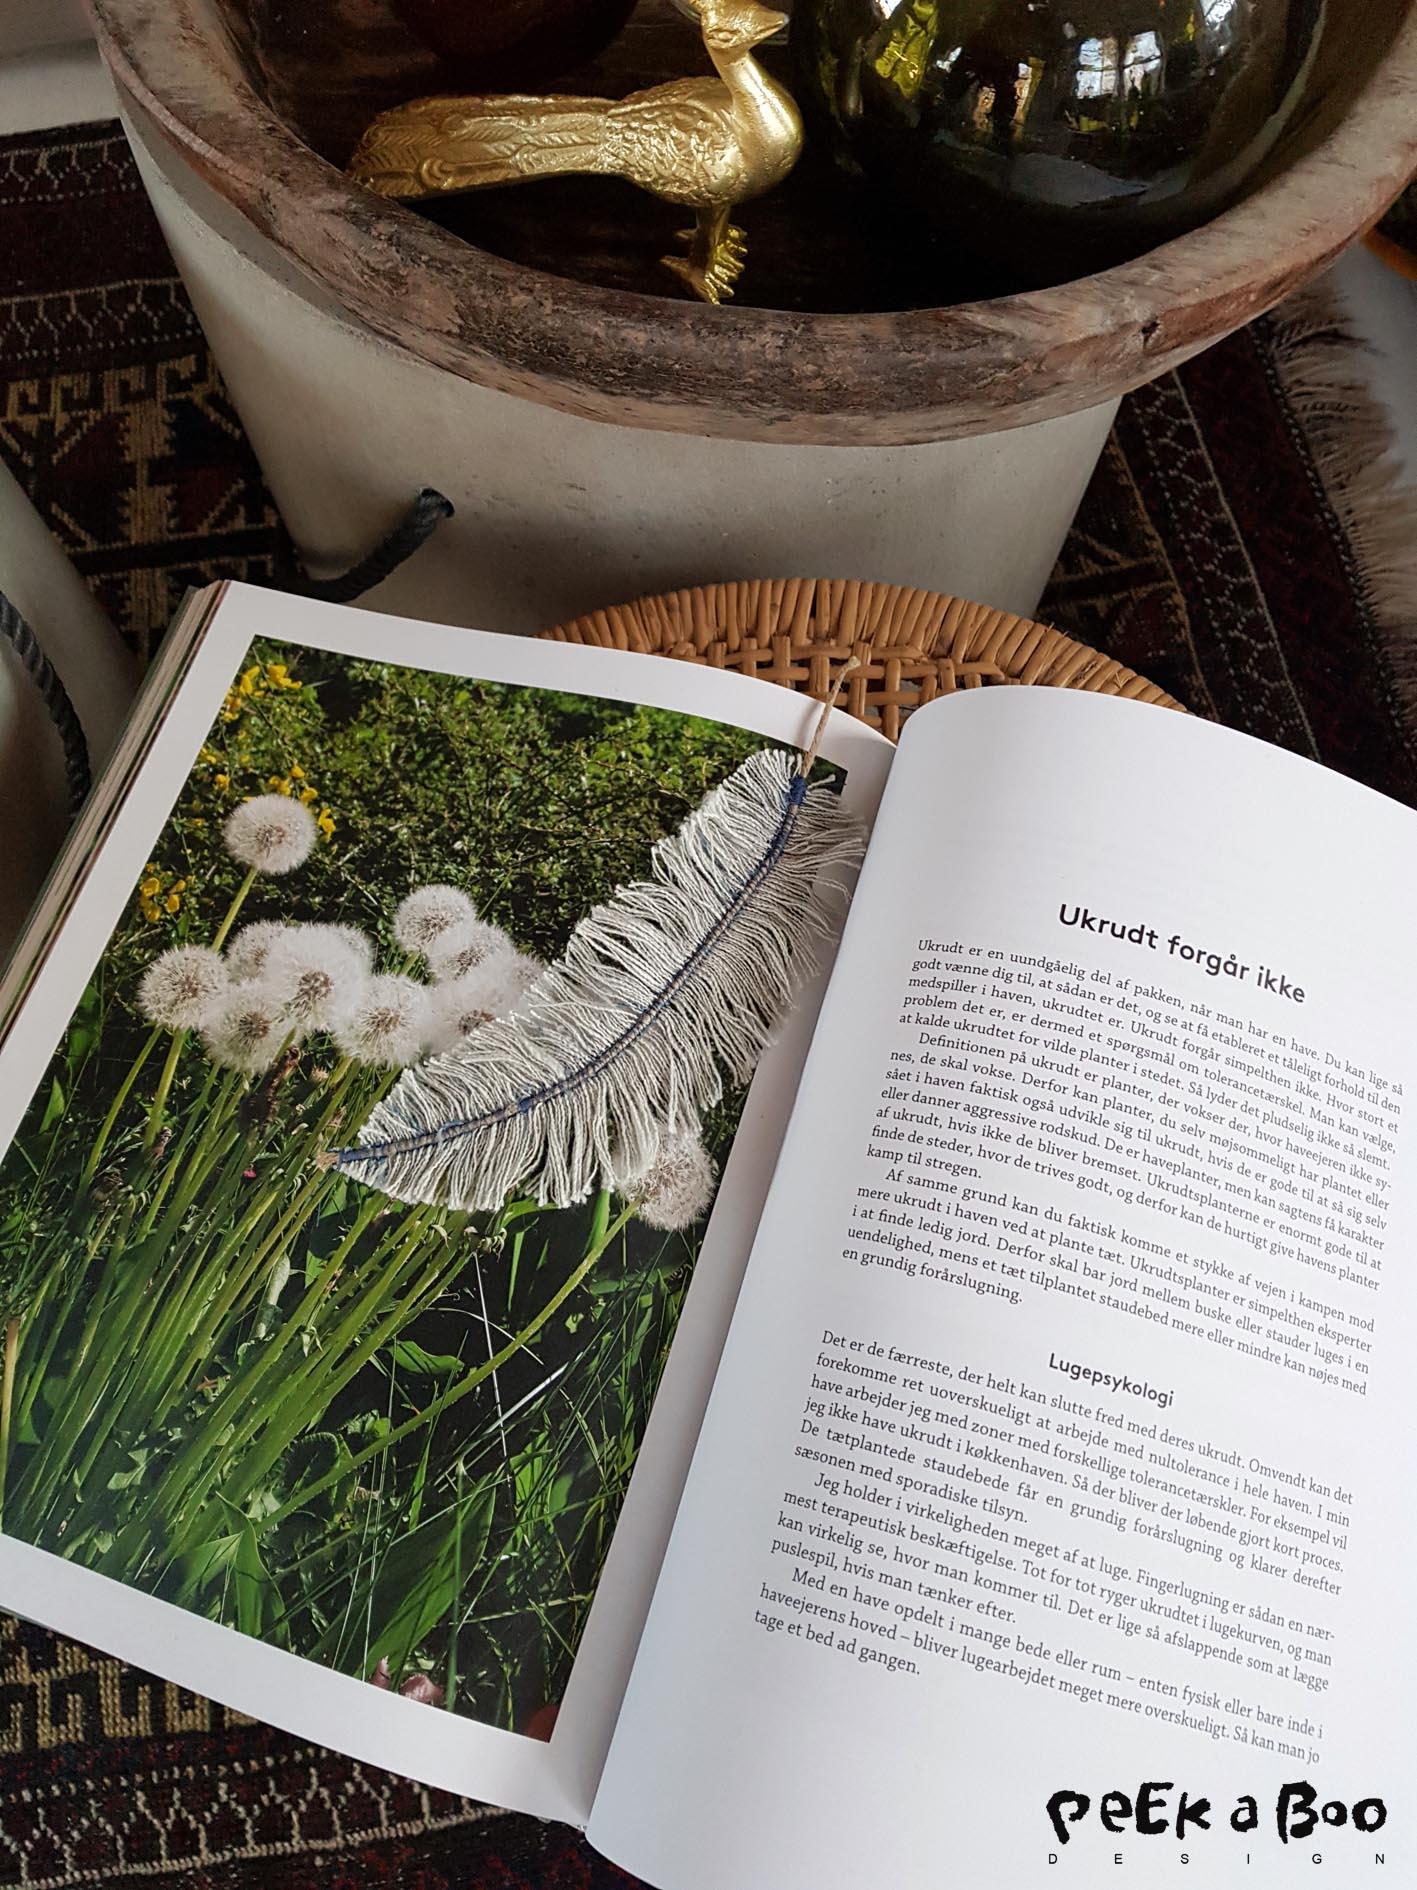 More inspiring photos from the book Slip haveglæden løs by Lotte Bjarke.